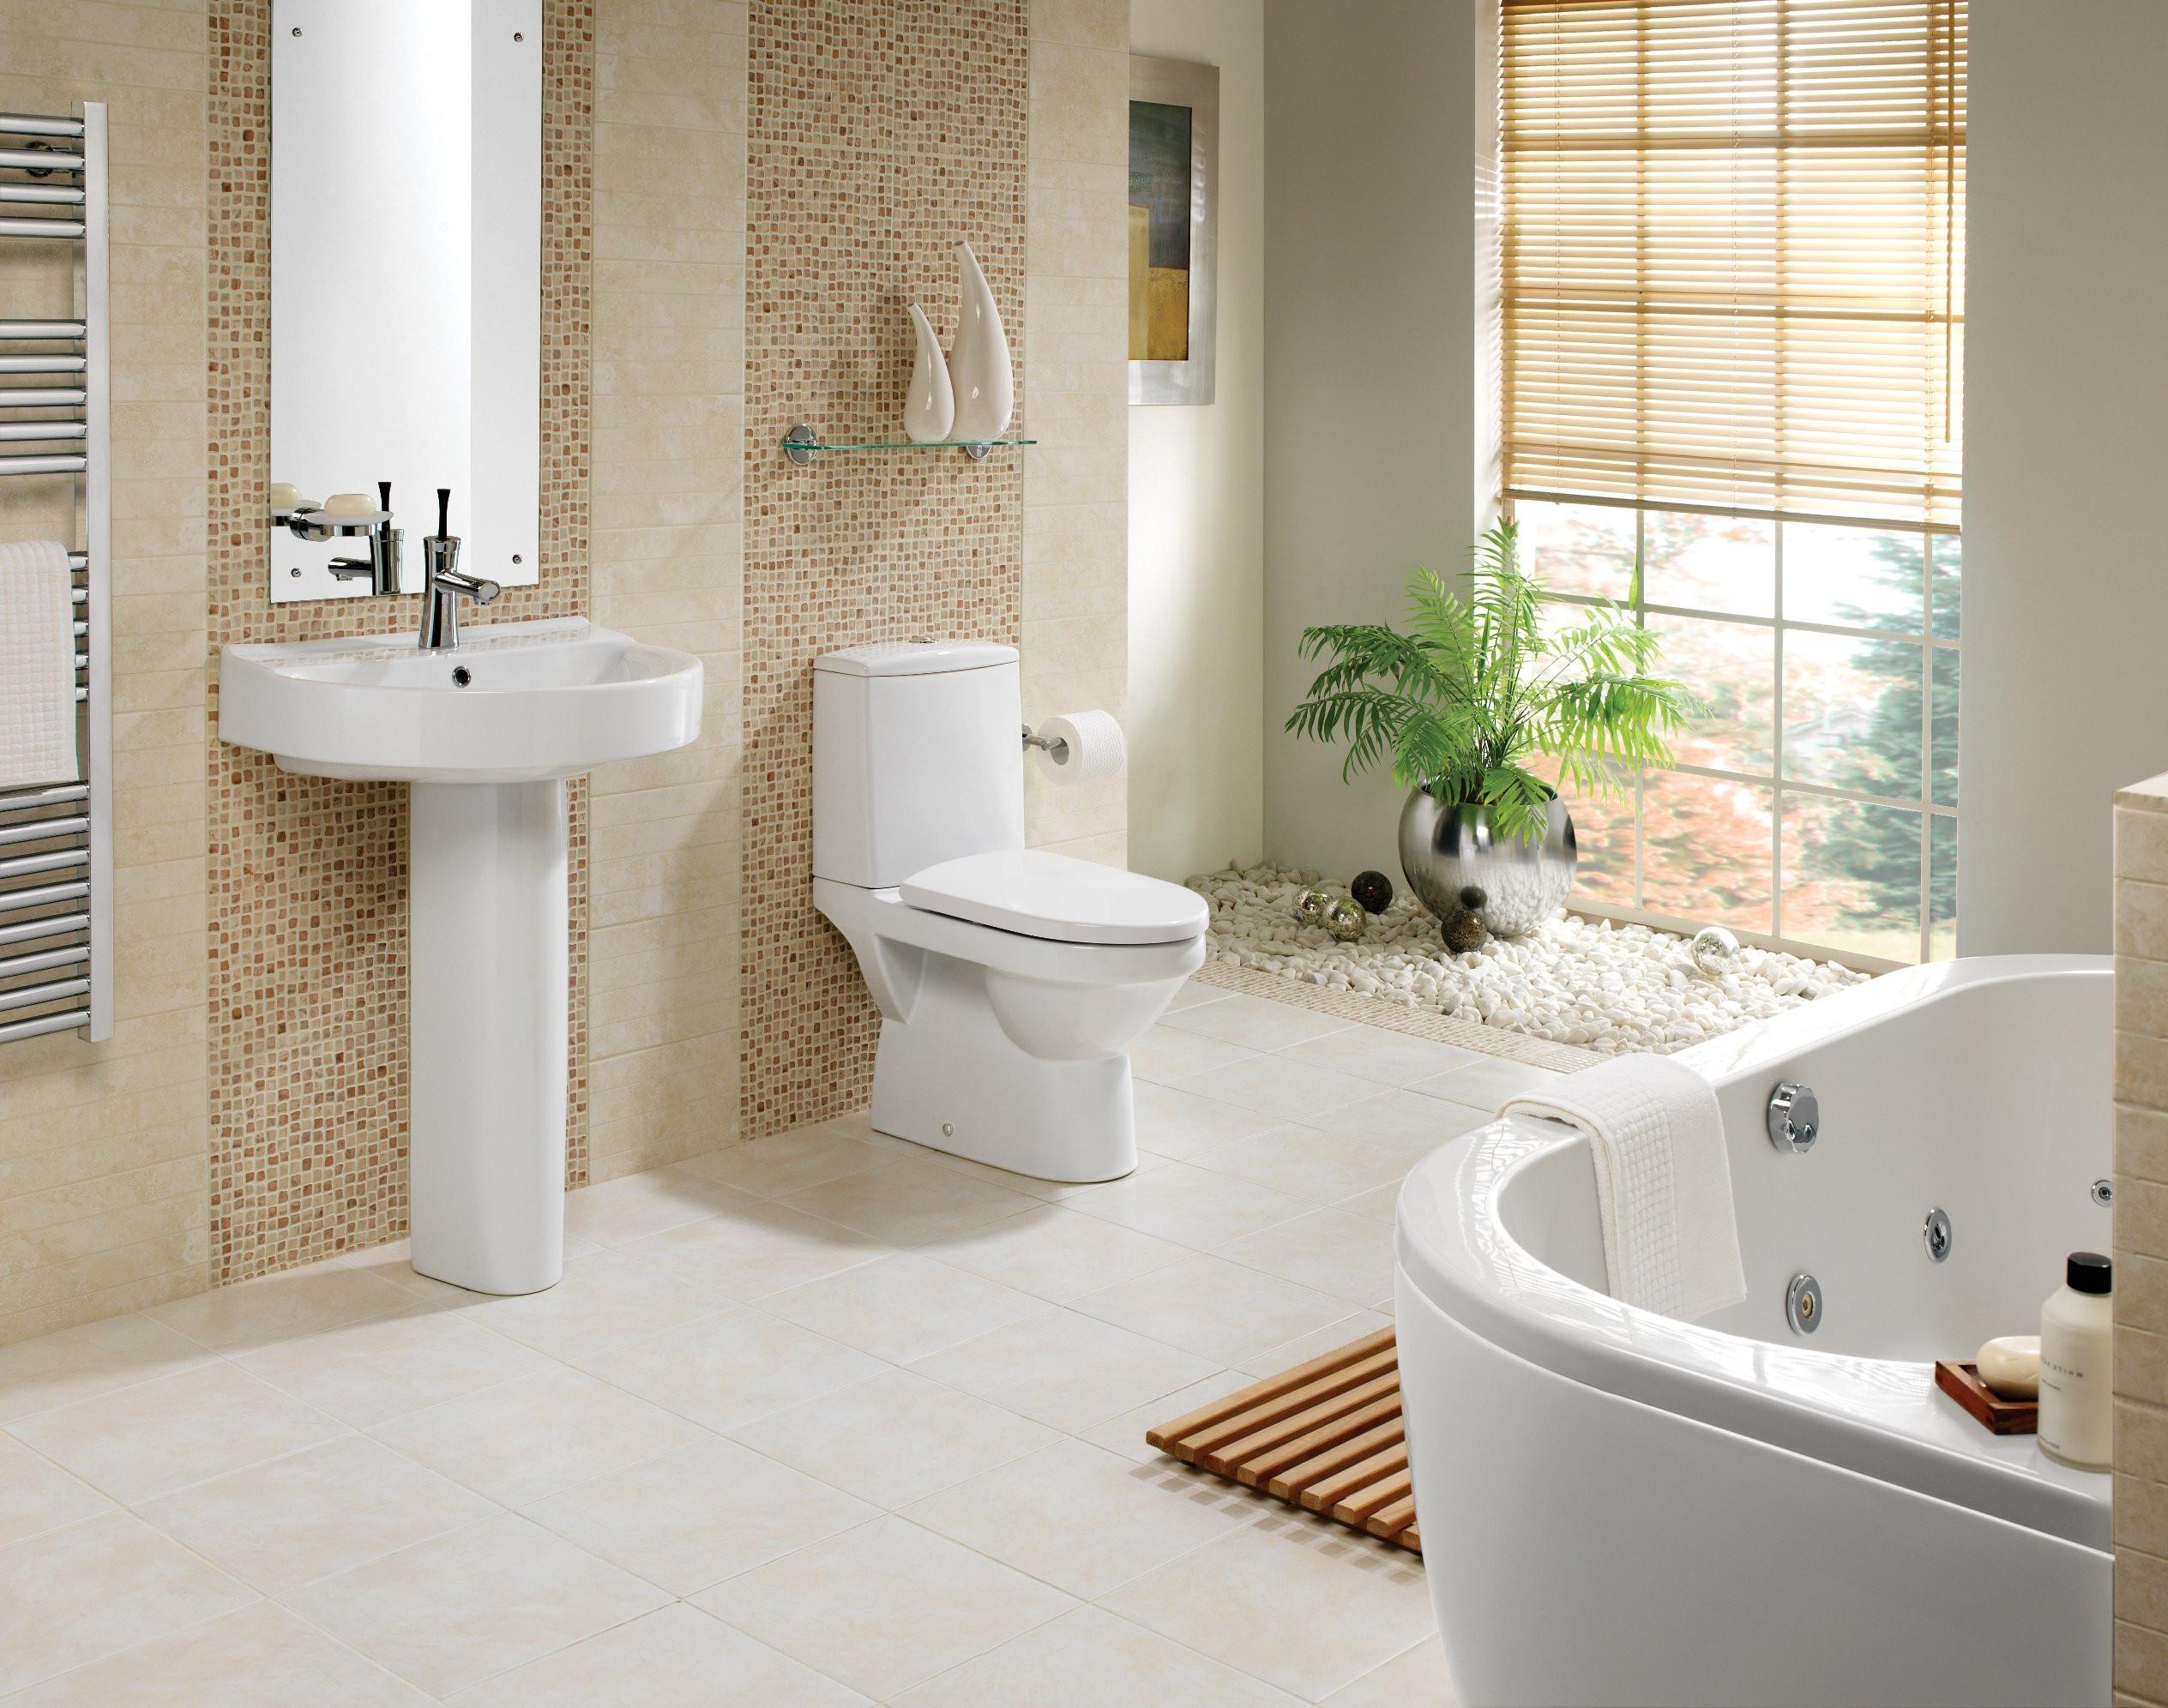 Modern Bathroom Design Ideas  33 Modern Bathroom Design For Your Home – The WoW Style